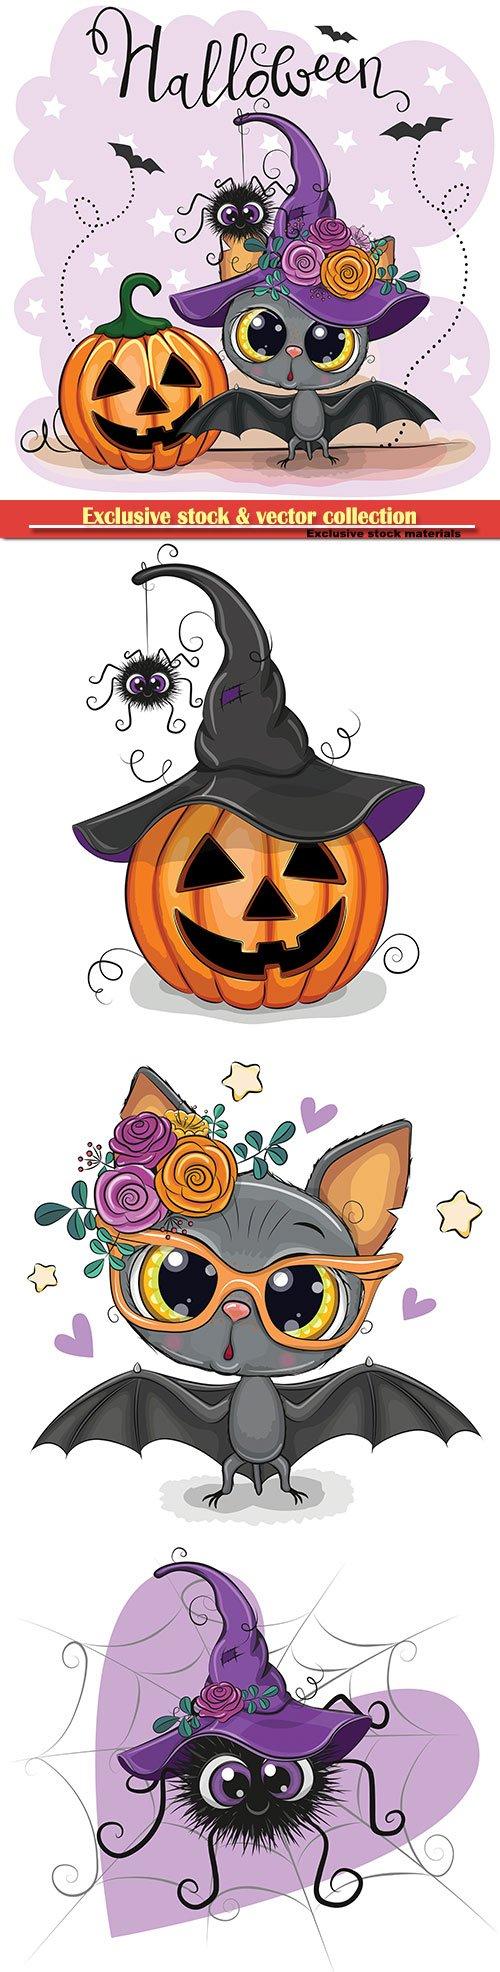 Halloween illustrations and design vector elements